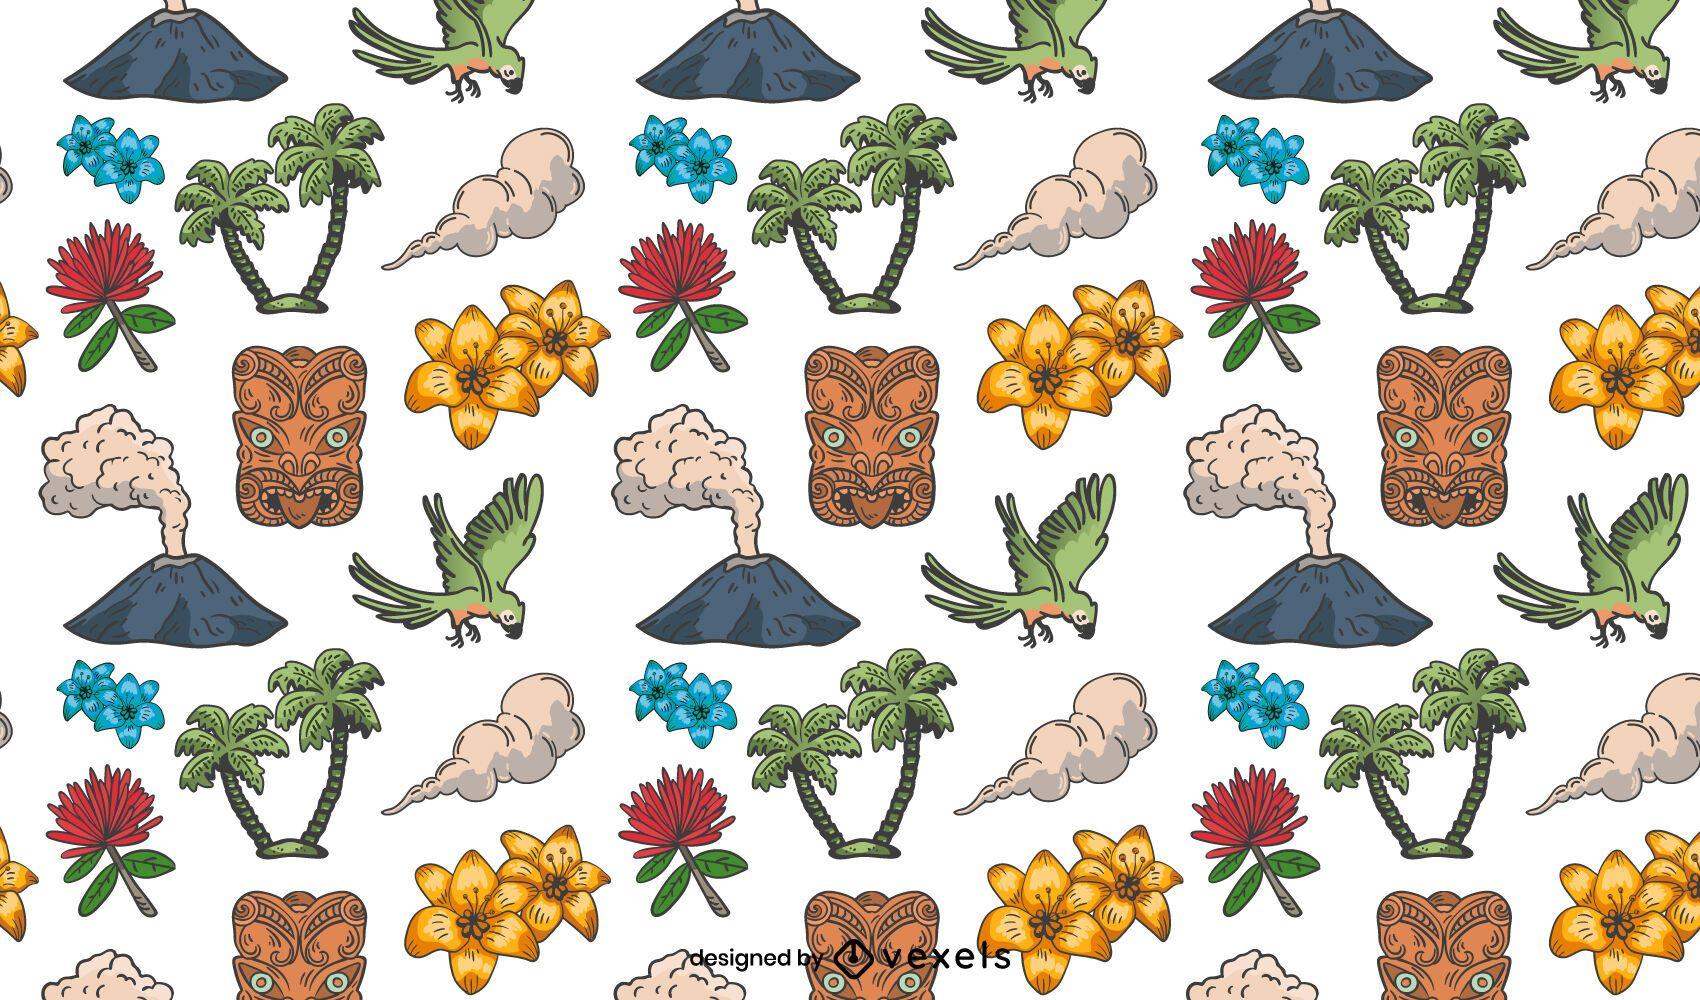 Tropical island elements pattern design